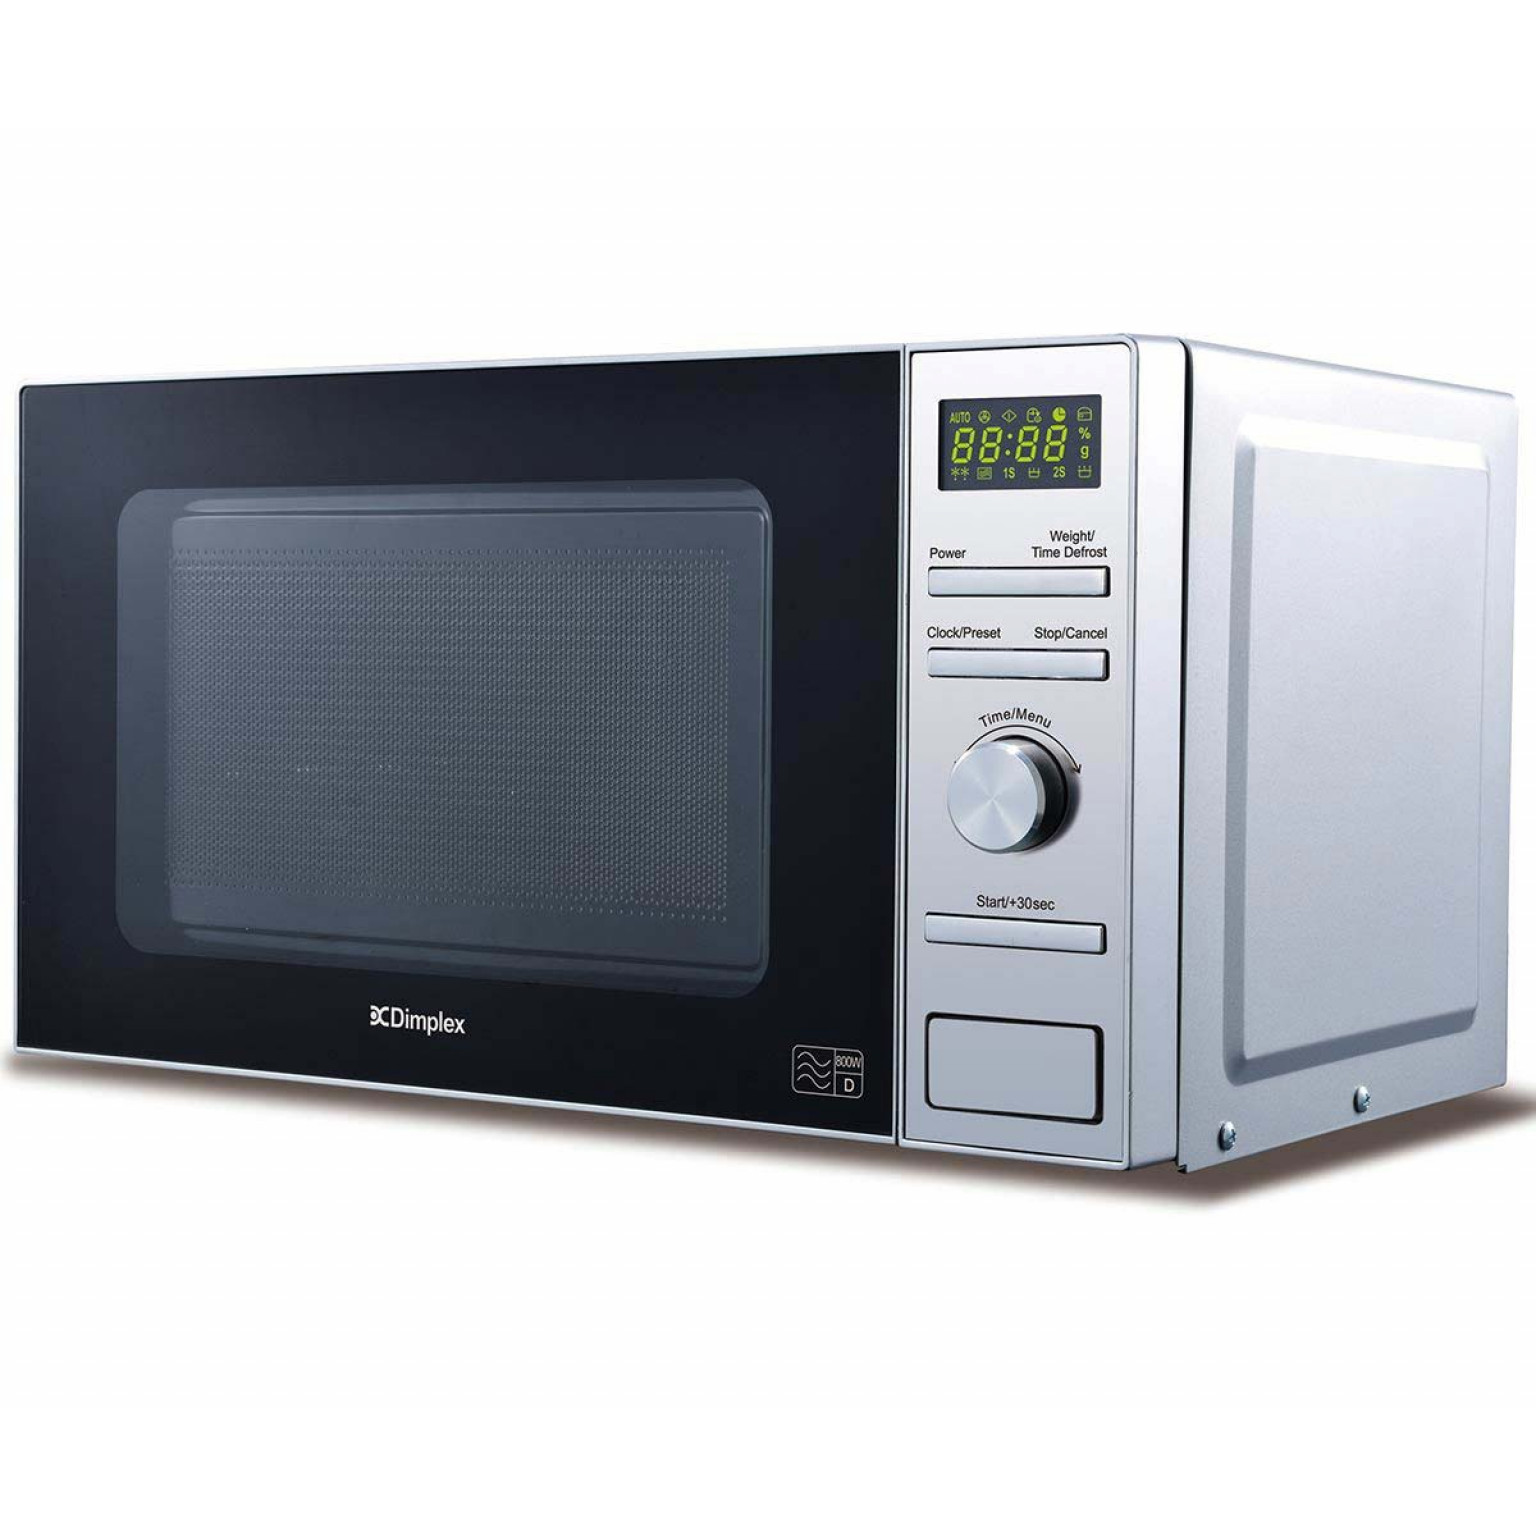 Dimplex 20L Silver Microwave | 980535